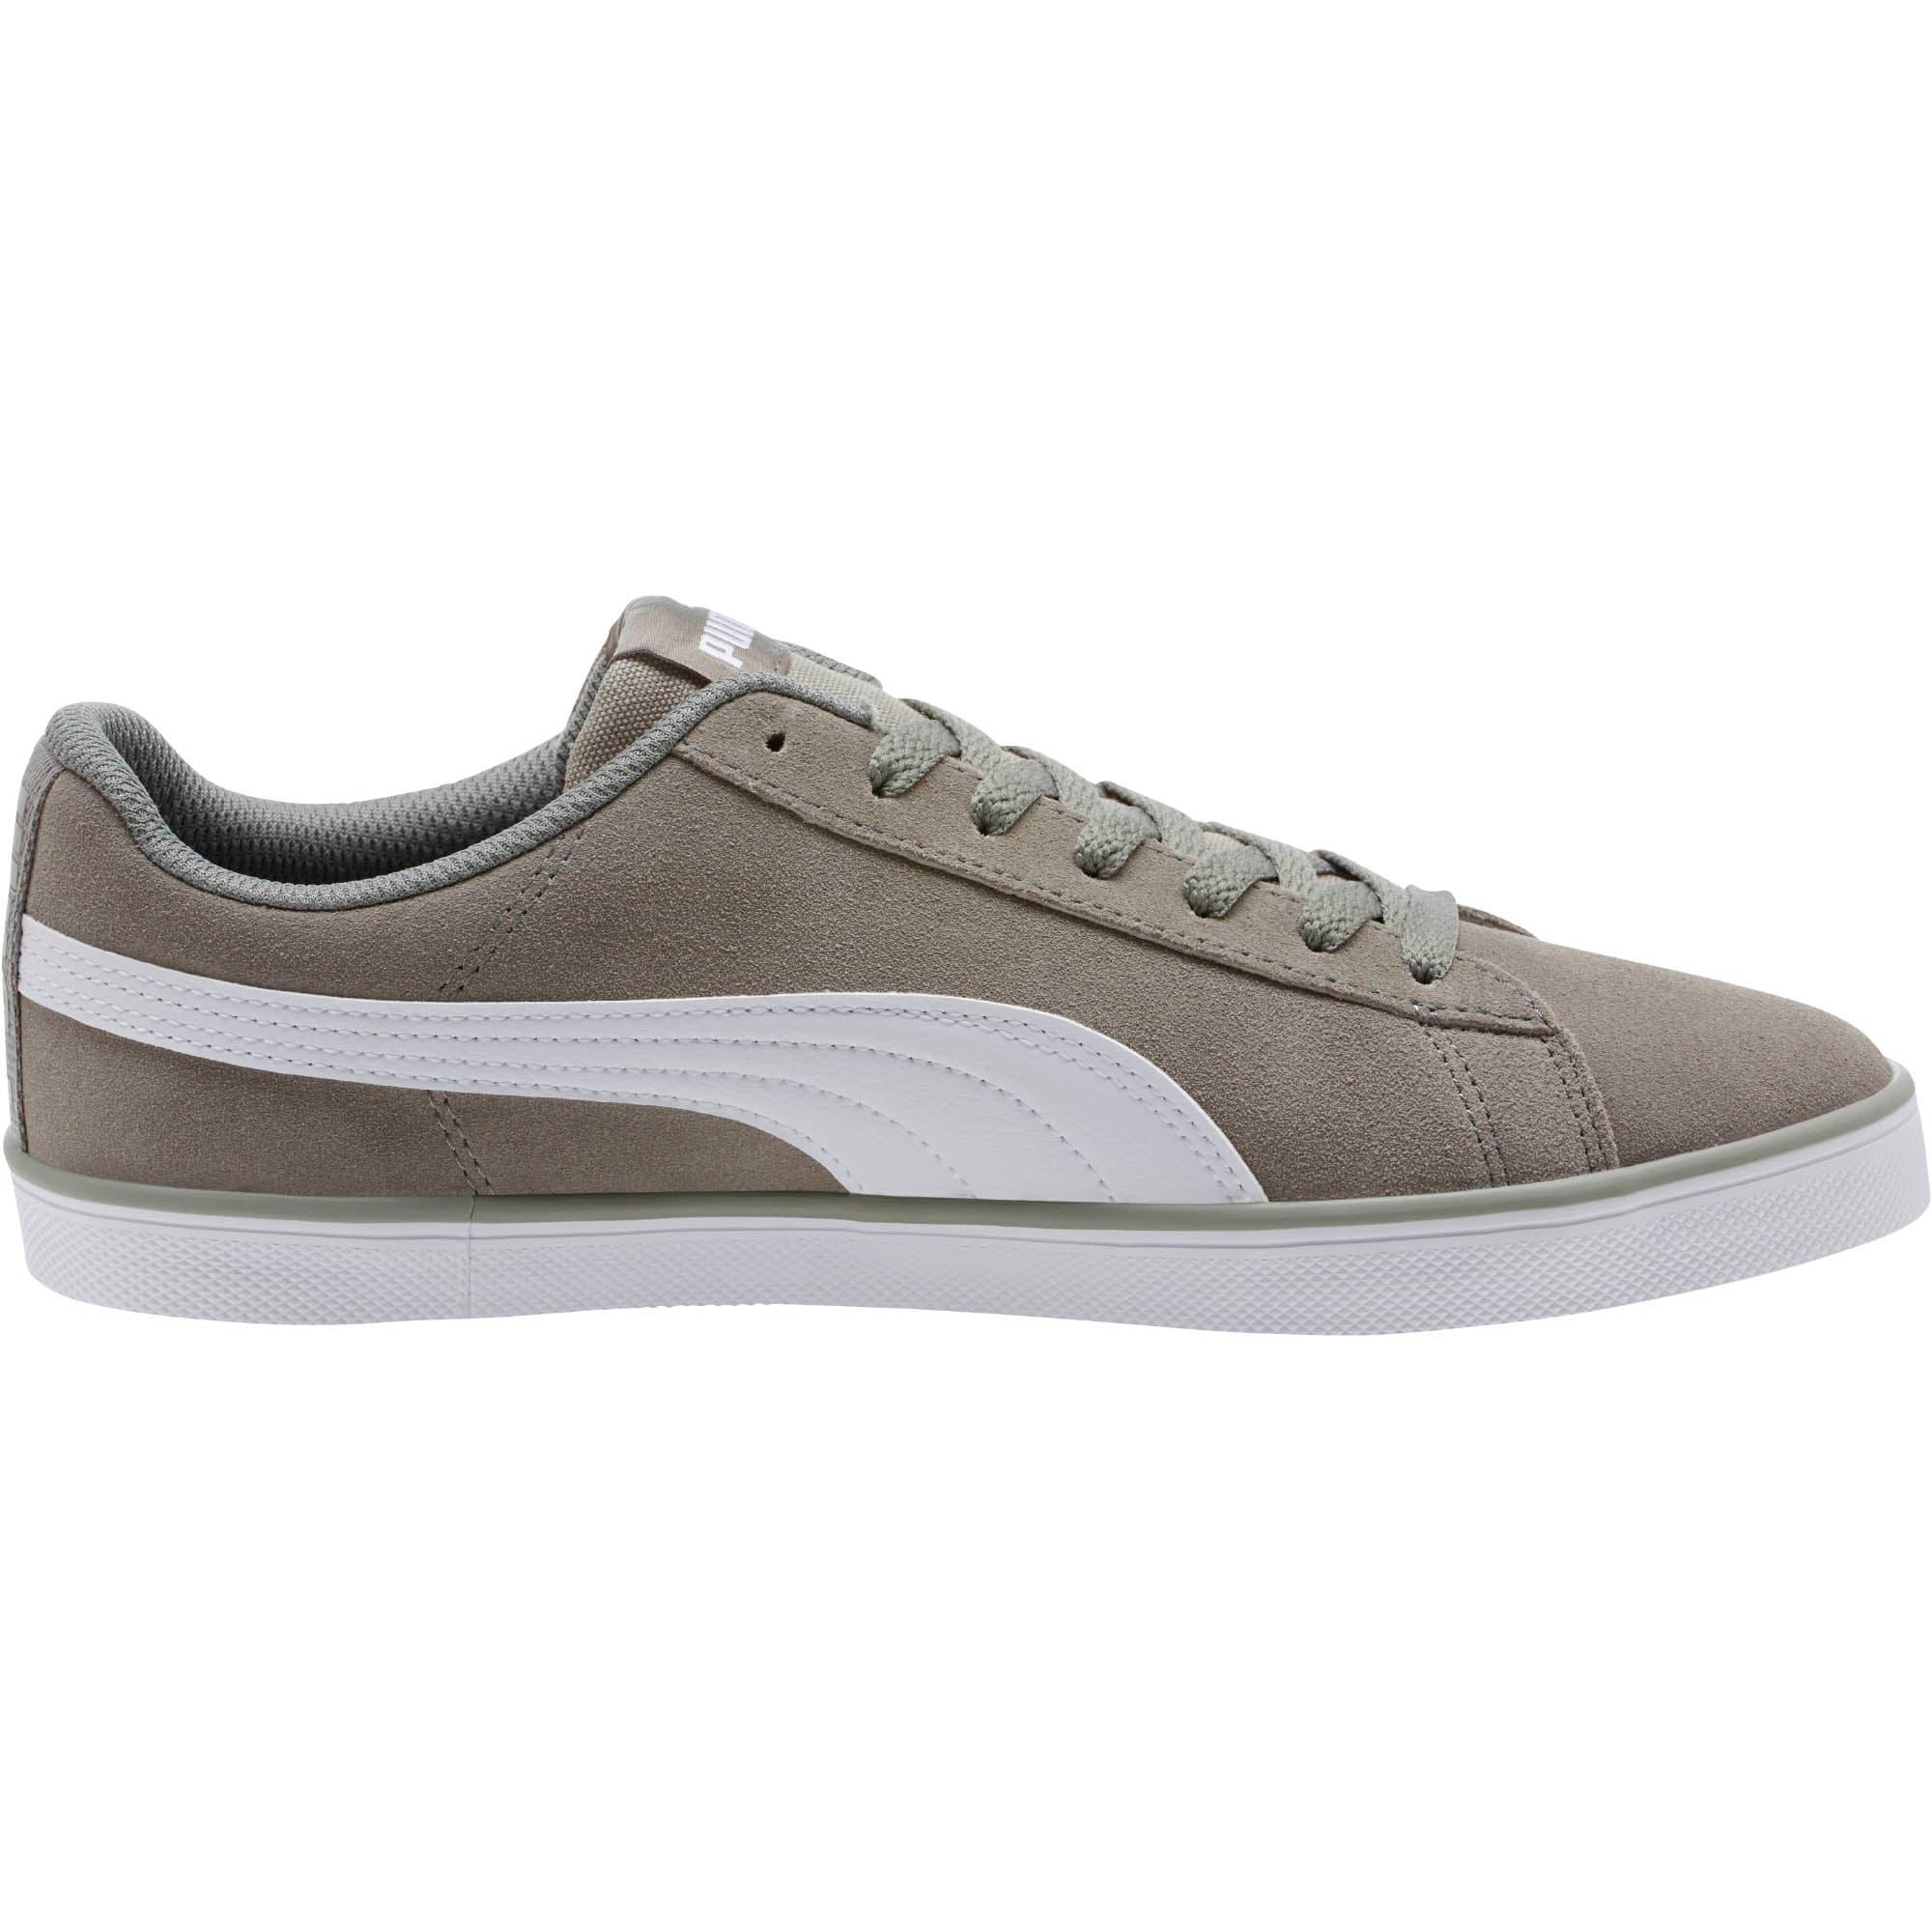 Thumbnail 3 of Urban Plus Suede Sneakers, Rock Ridge-Puma White, medium